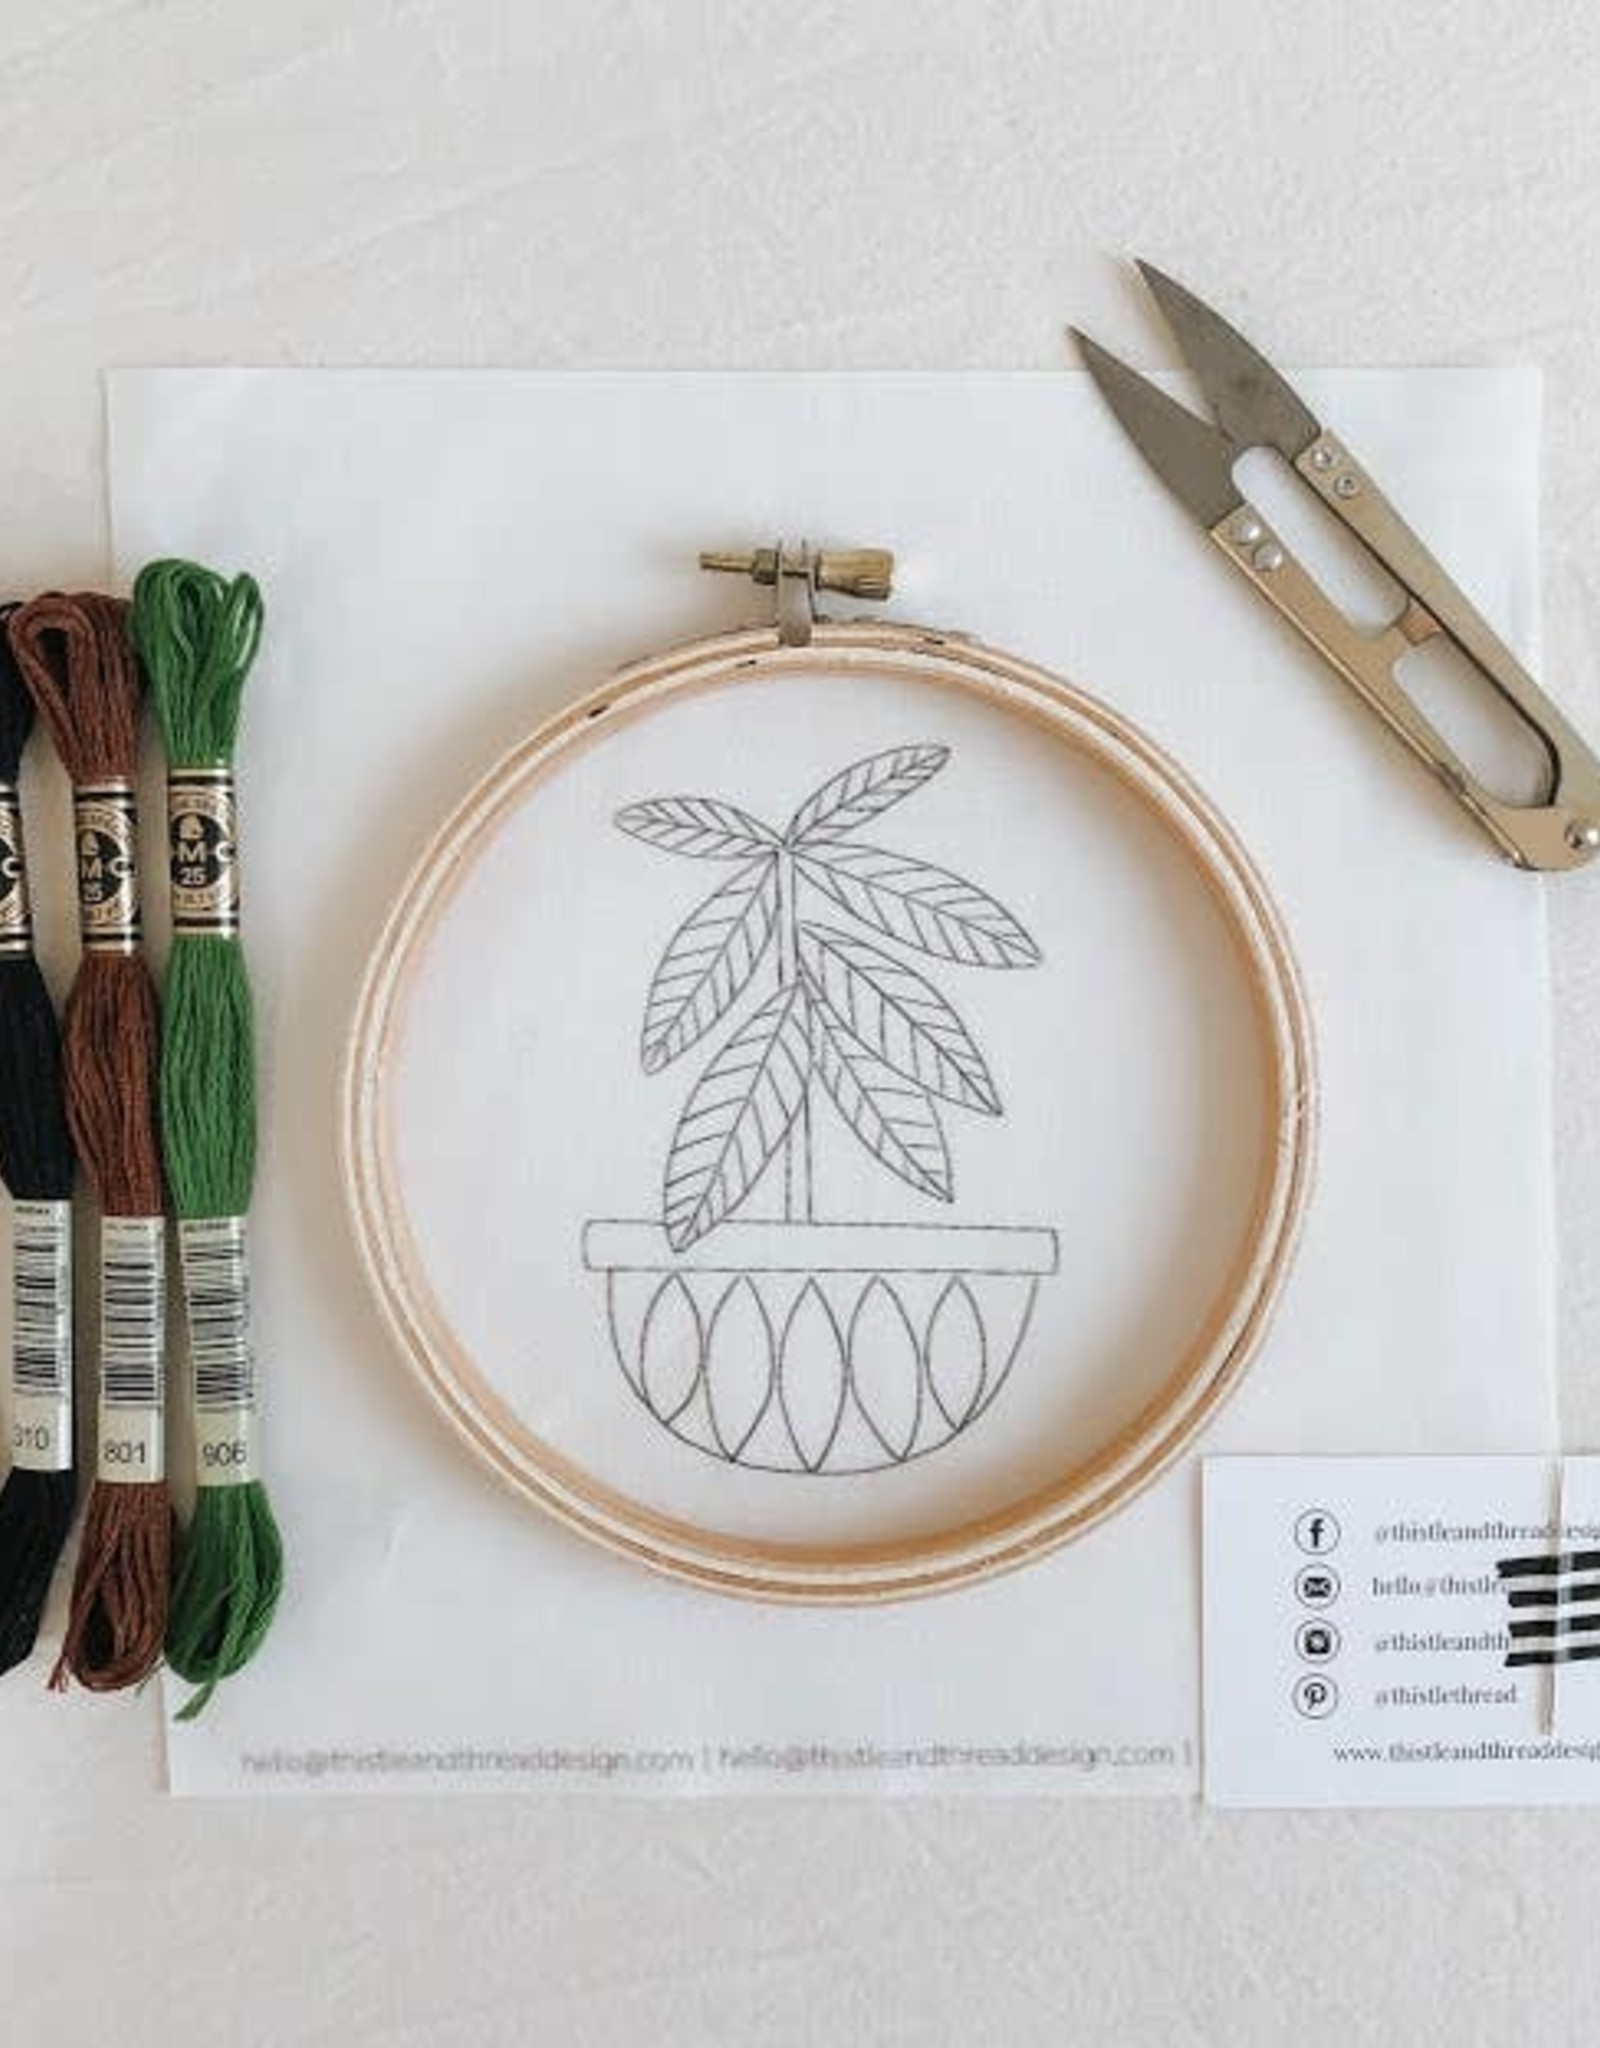 Thistle & Thread Thistle & Thread | Rubber Tree Embroidery Kit